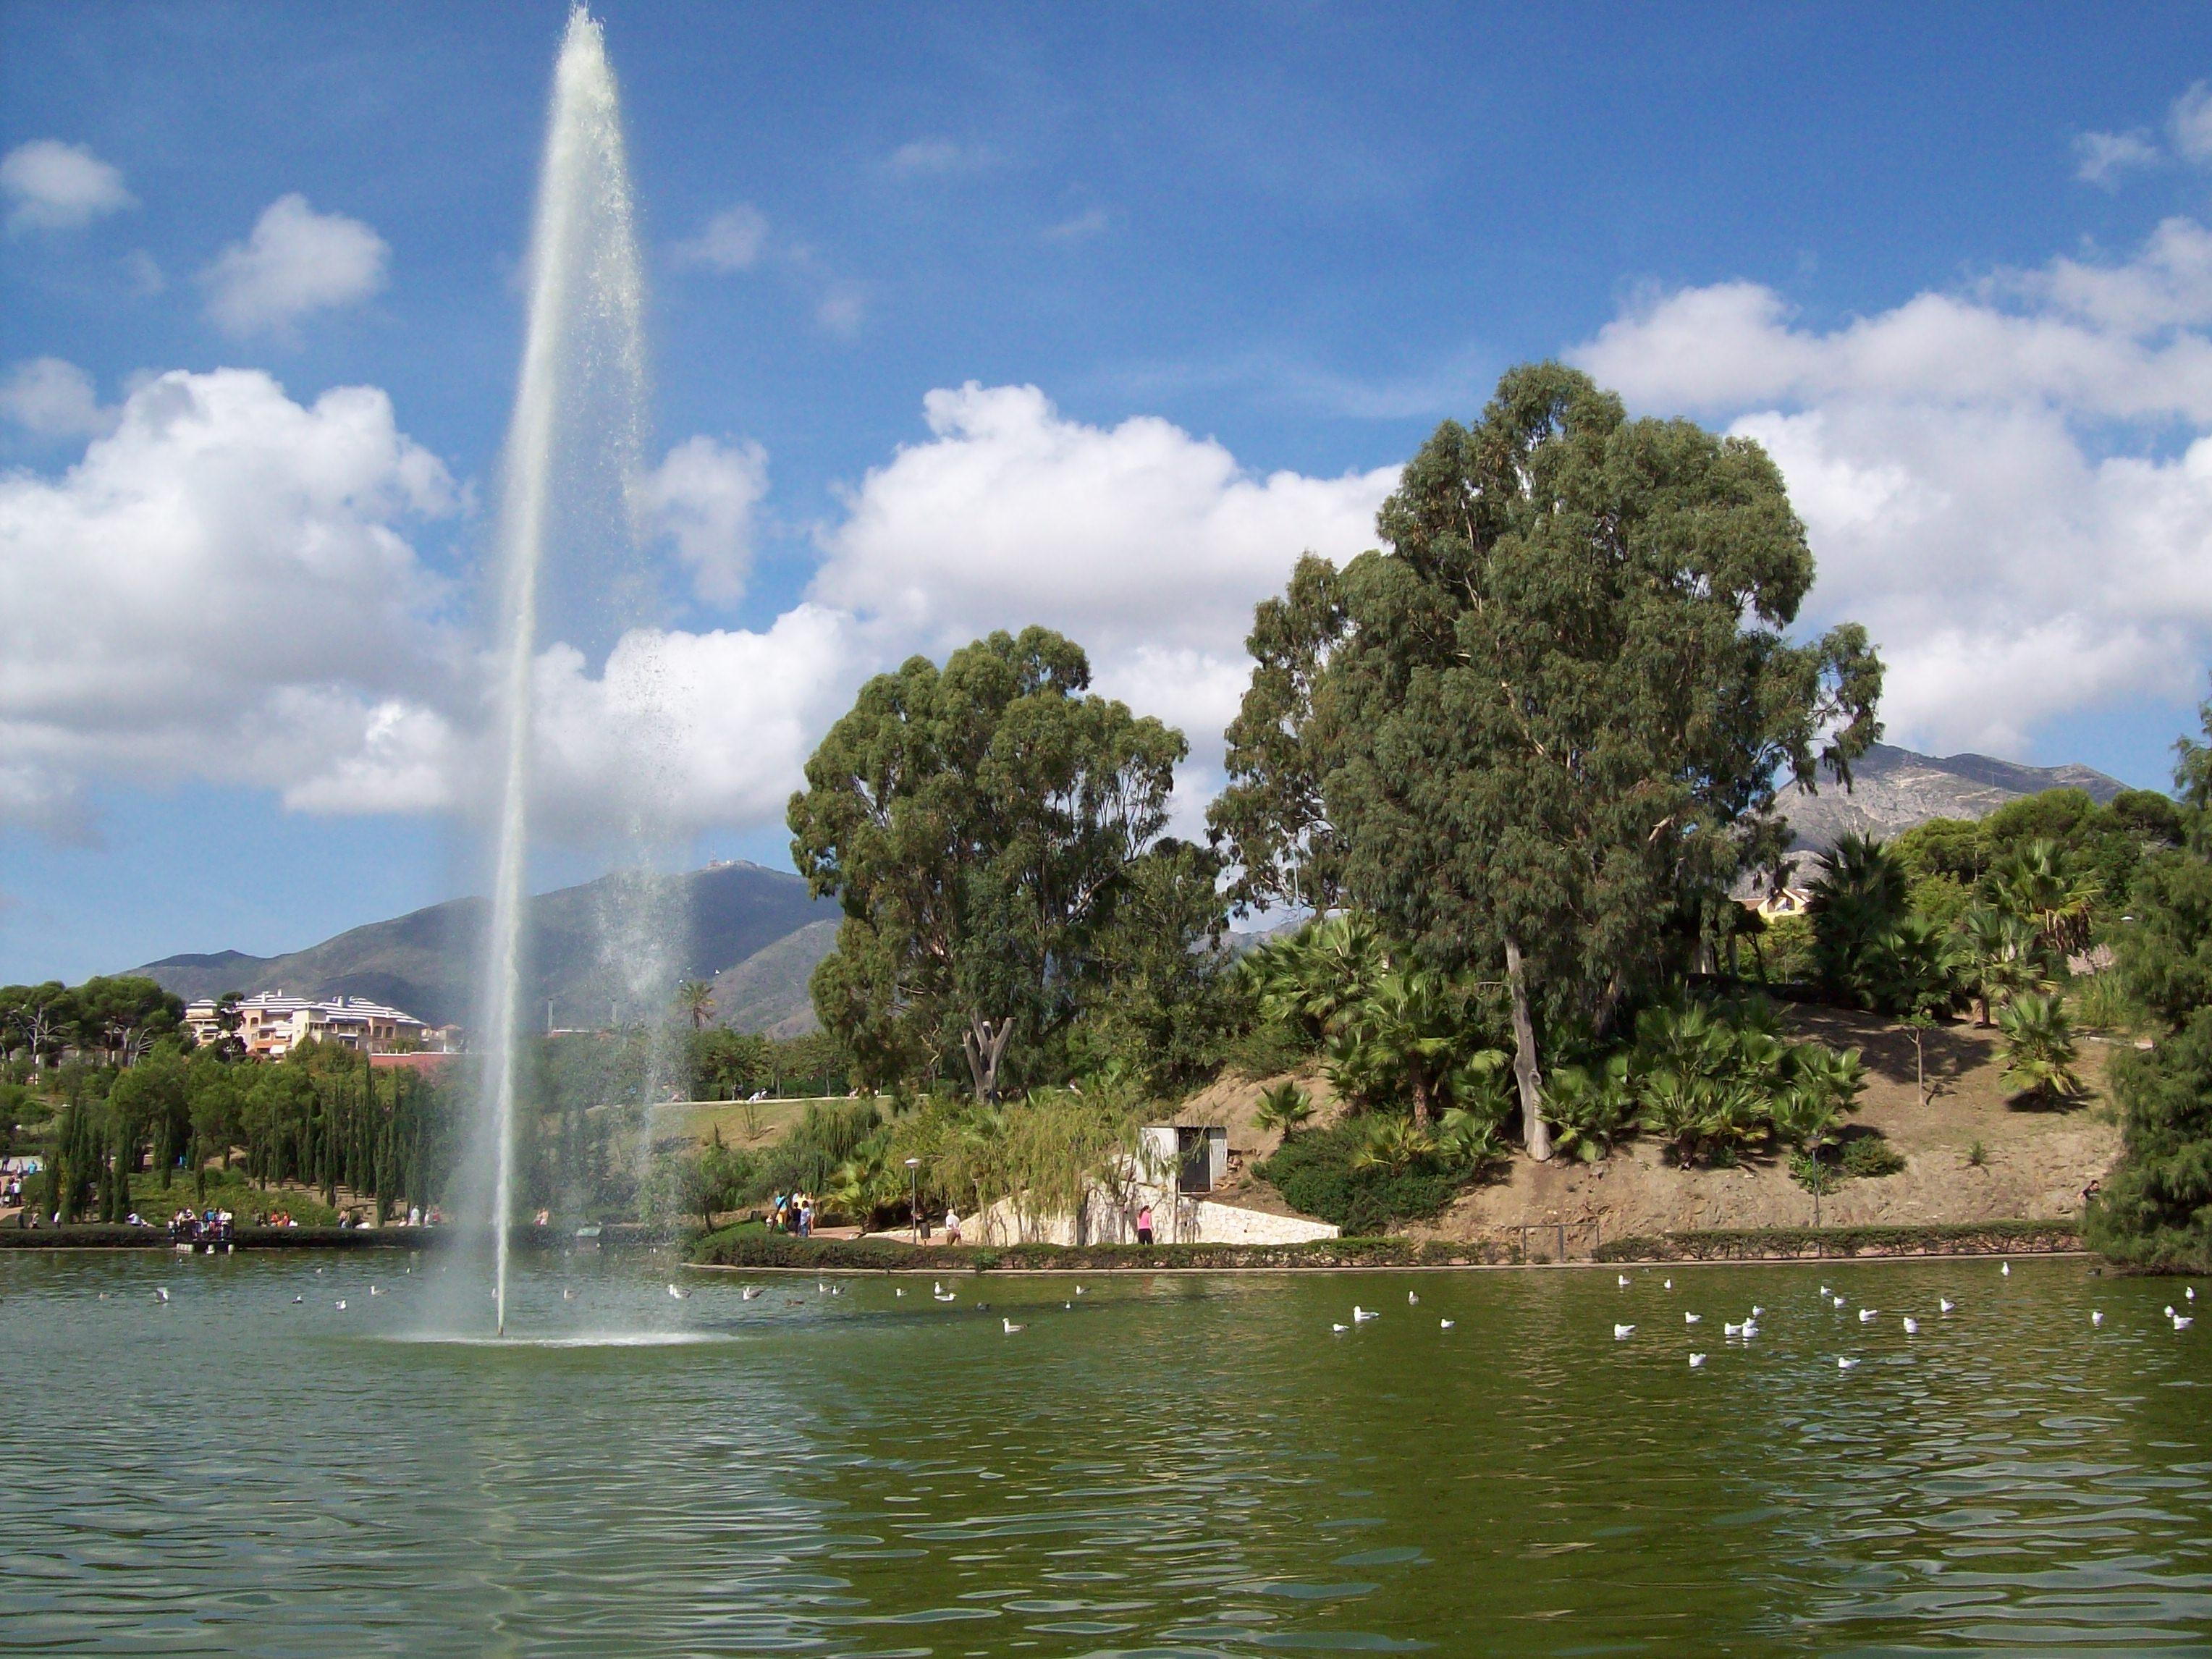 Parque_de_la_Paloma_pond